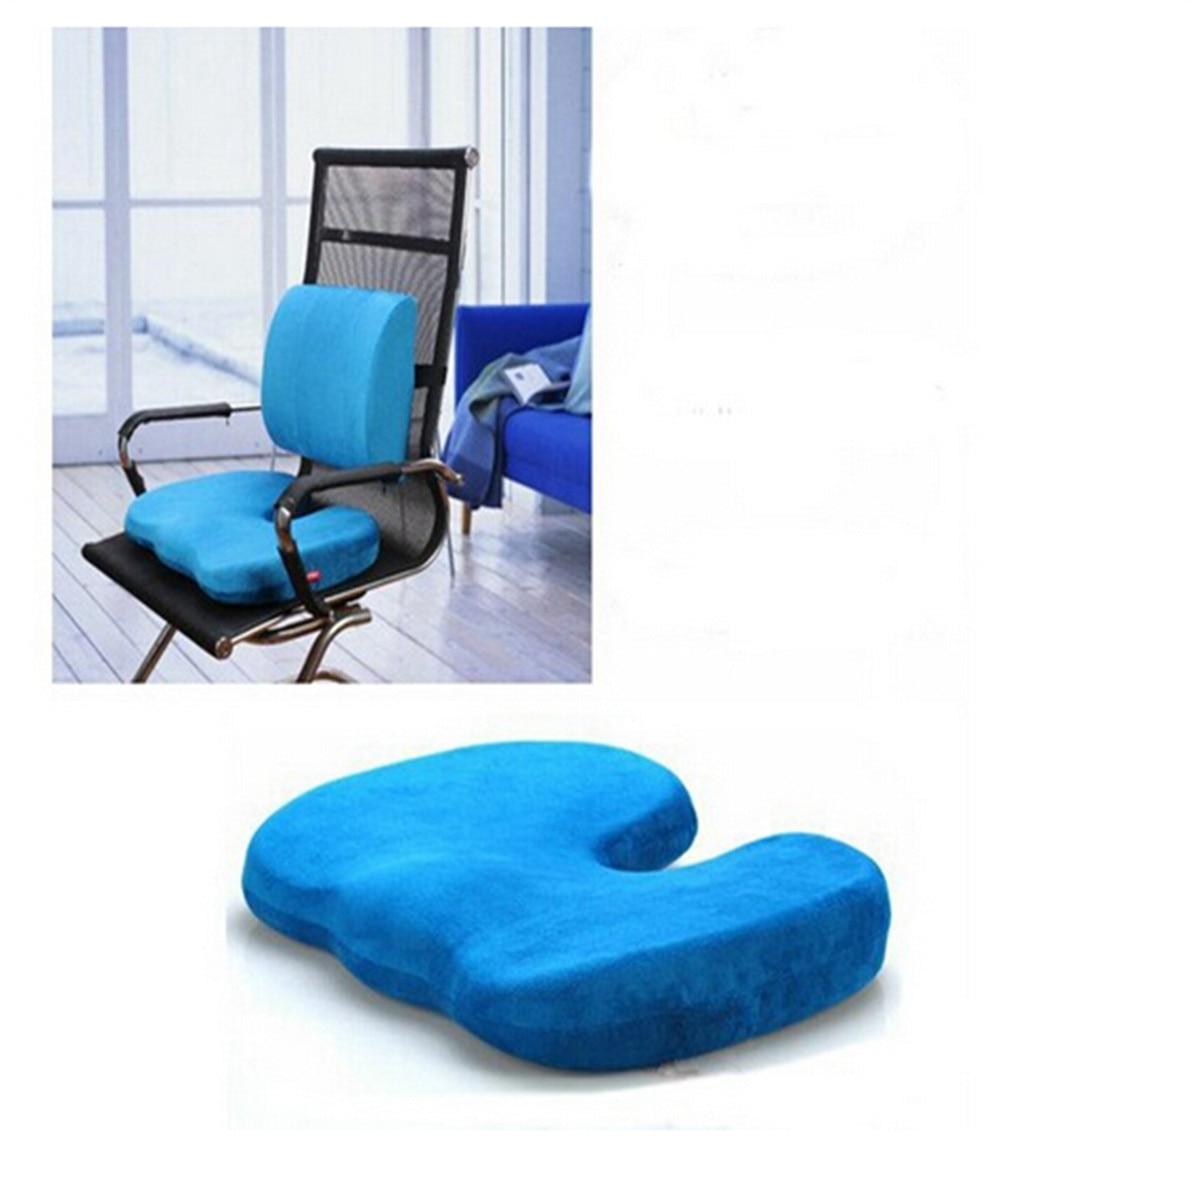 Best Office Chair For Hemorrhoids Zebra Chairs Target Hemorrhoid Seat Cushion Memory Foam Coccyx Orthopedic Car